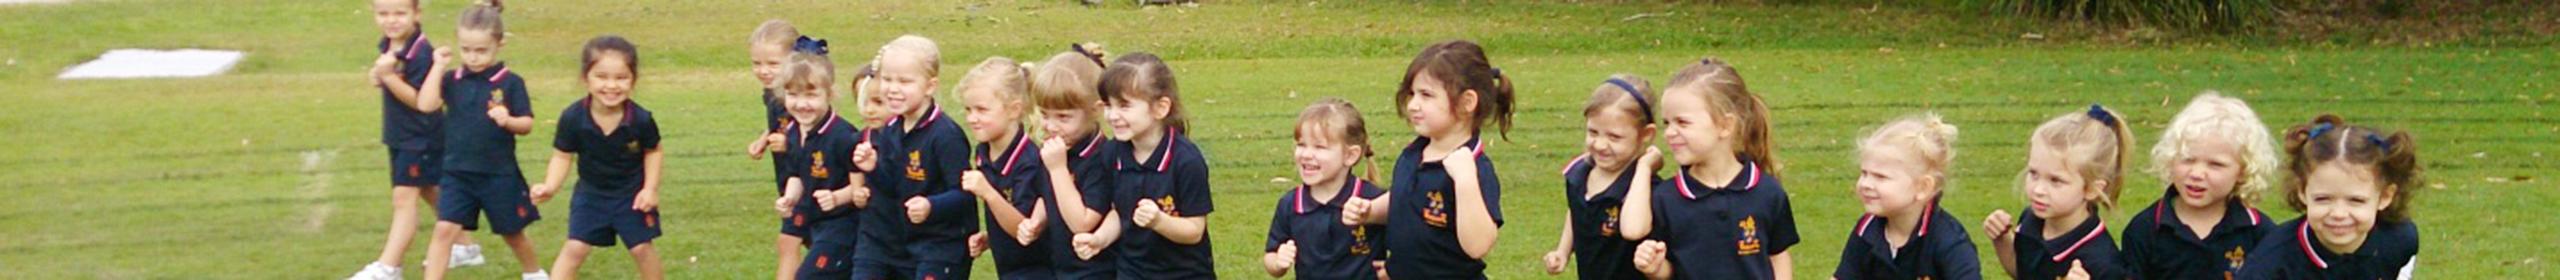 Traineeship in Childcare